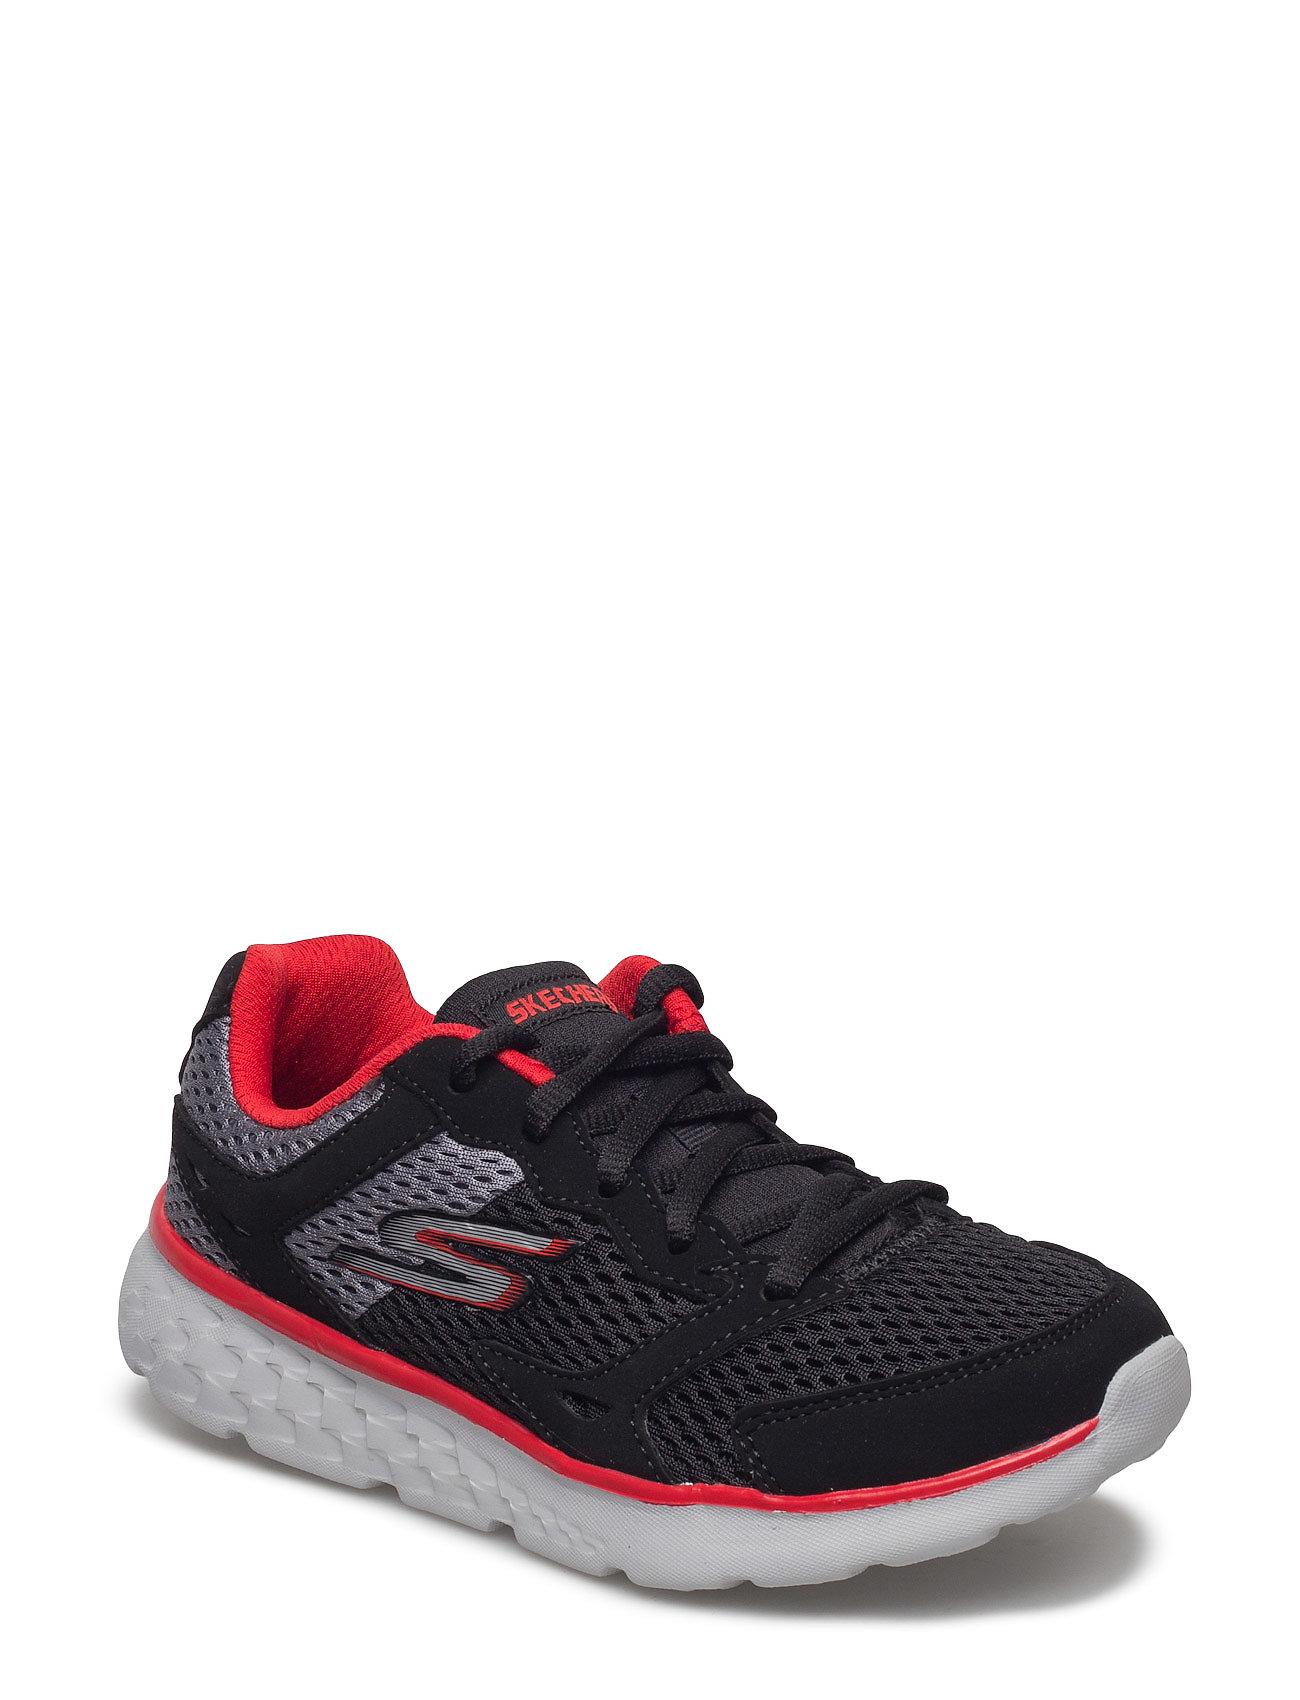 Image of Go Run 400 Sko Sort Skechers (3468421025)